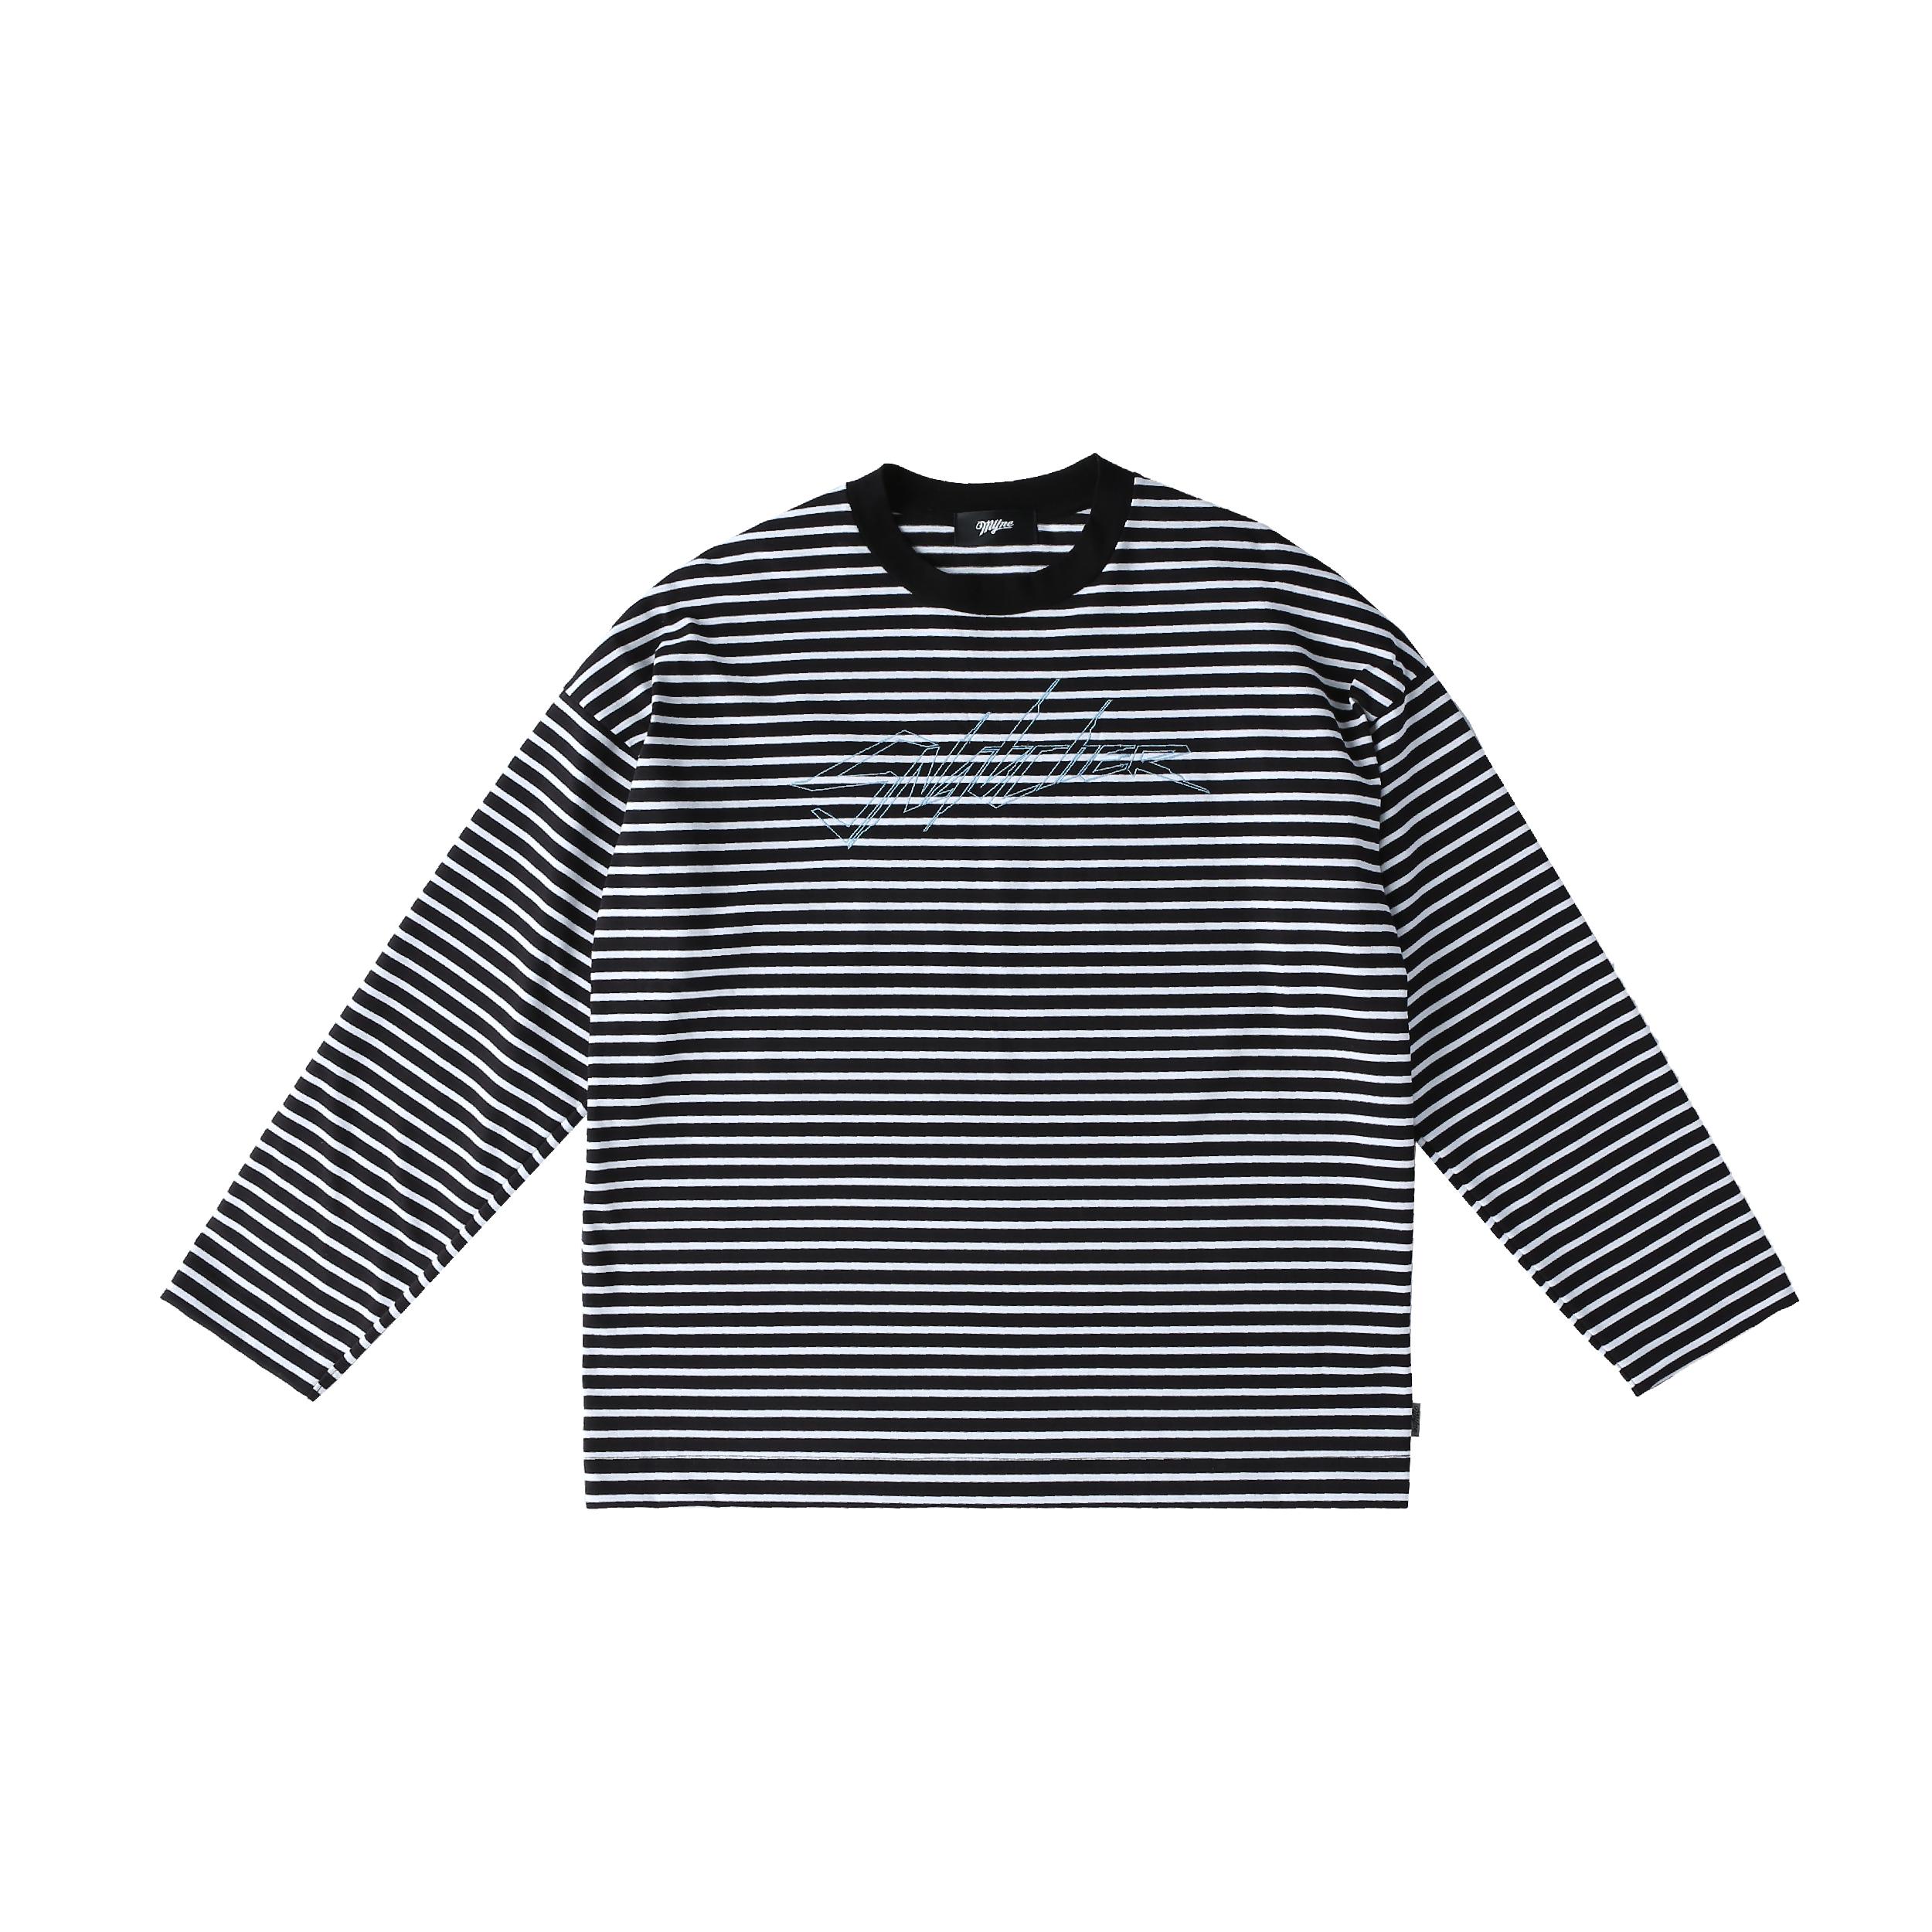 SNATCHER border T-shirt / BLACK - 画像1